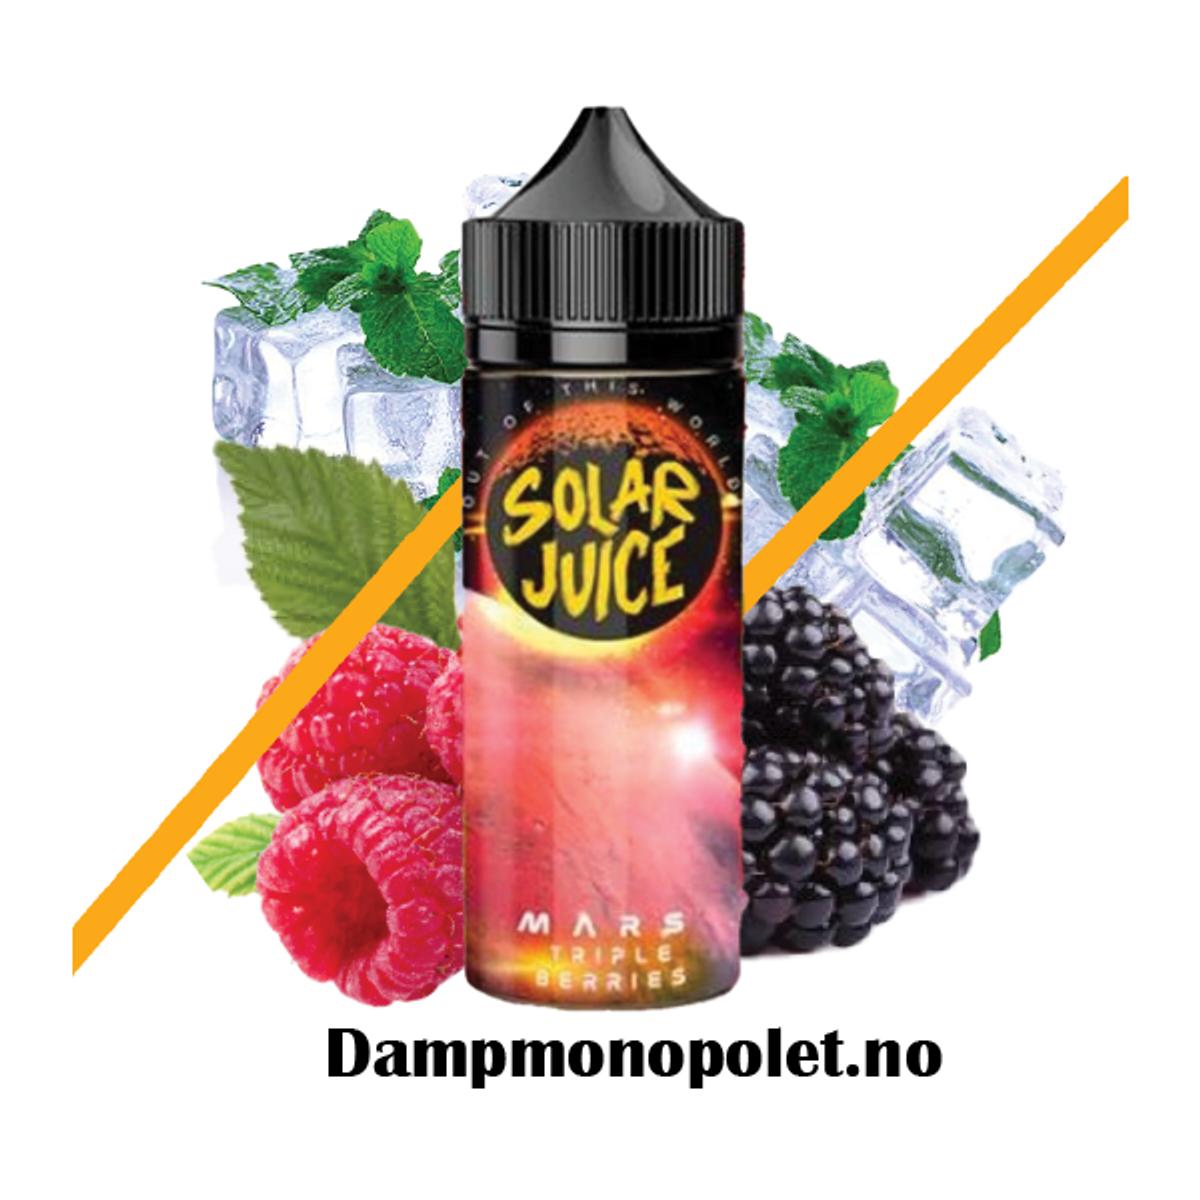 Solar Juice Mars, Triple Berries Ejuice 100/120ml